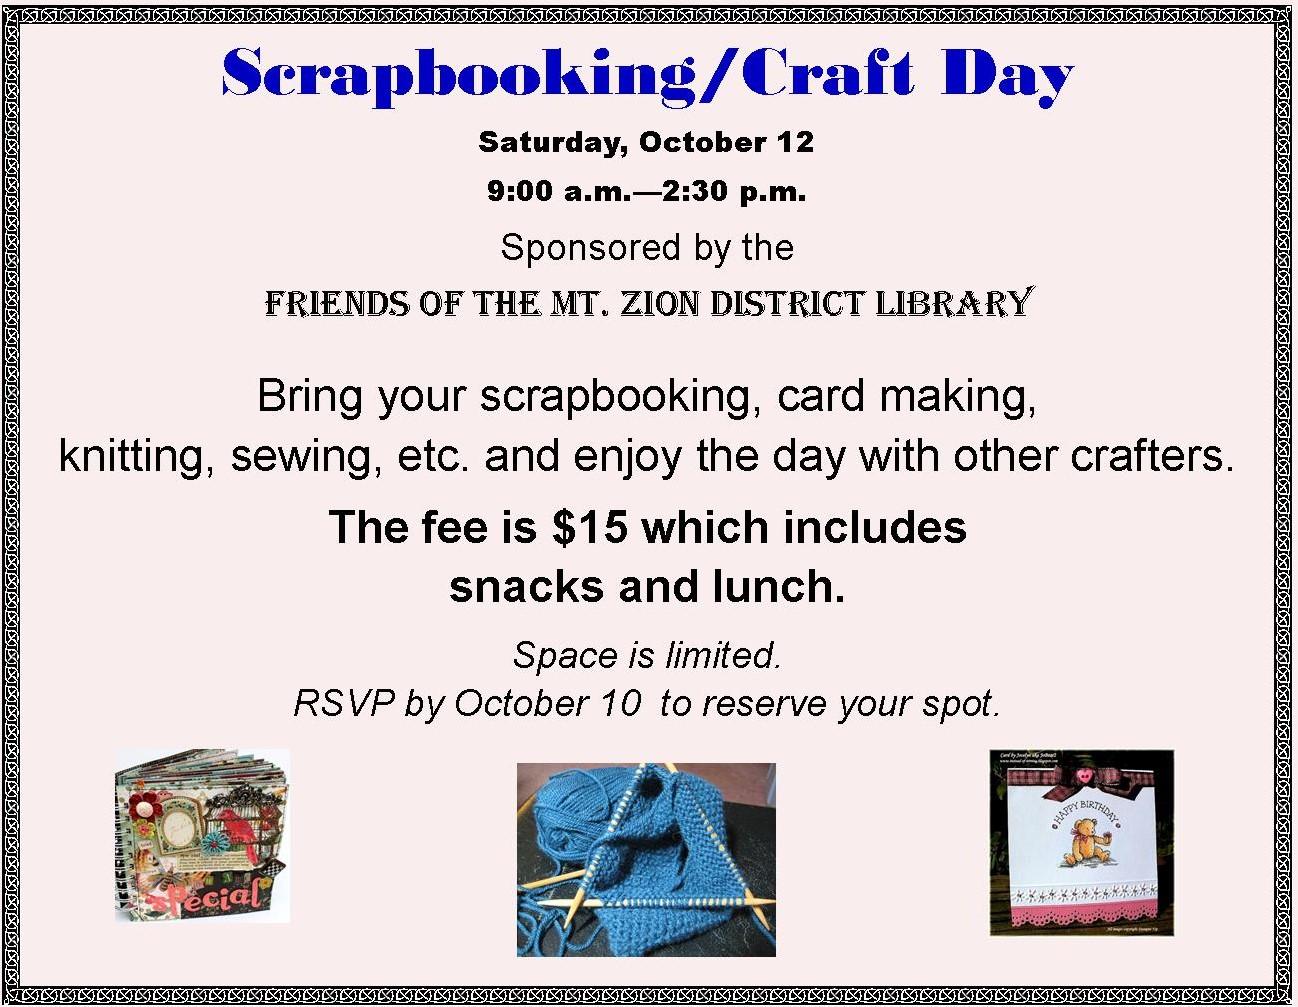 October 2019 Scrapbooking - craft day October 12 smaller for Board (2).jpg